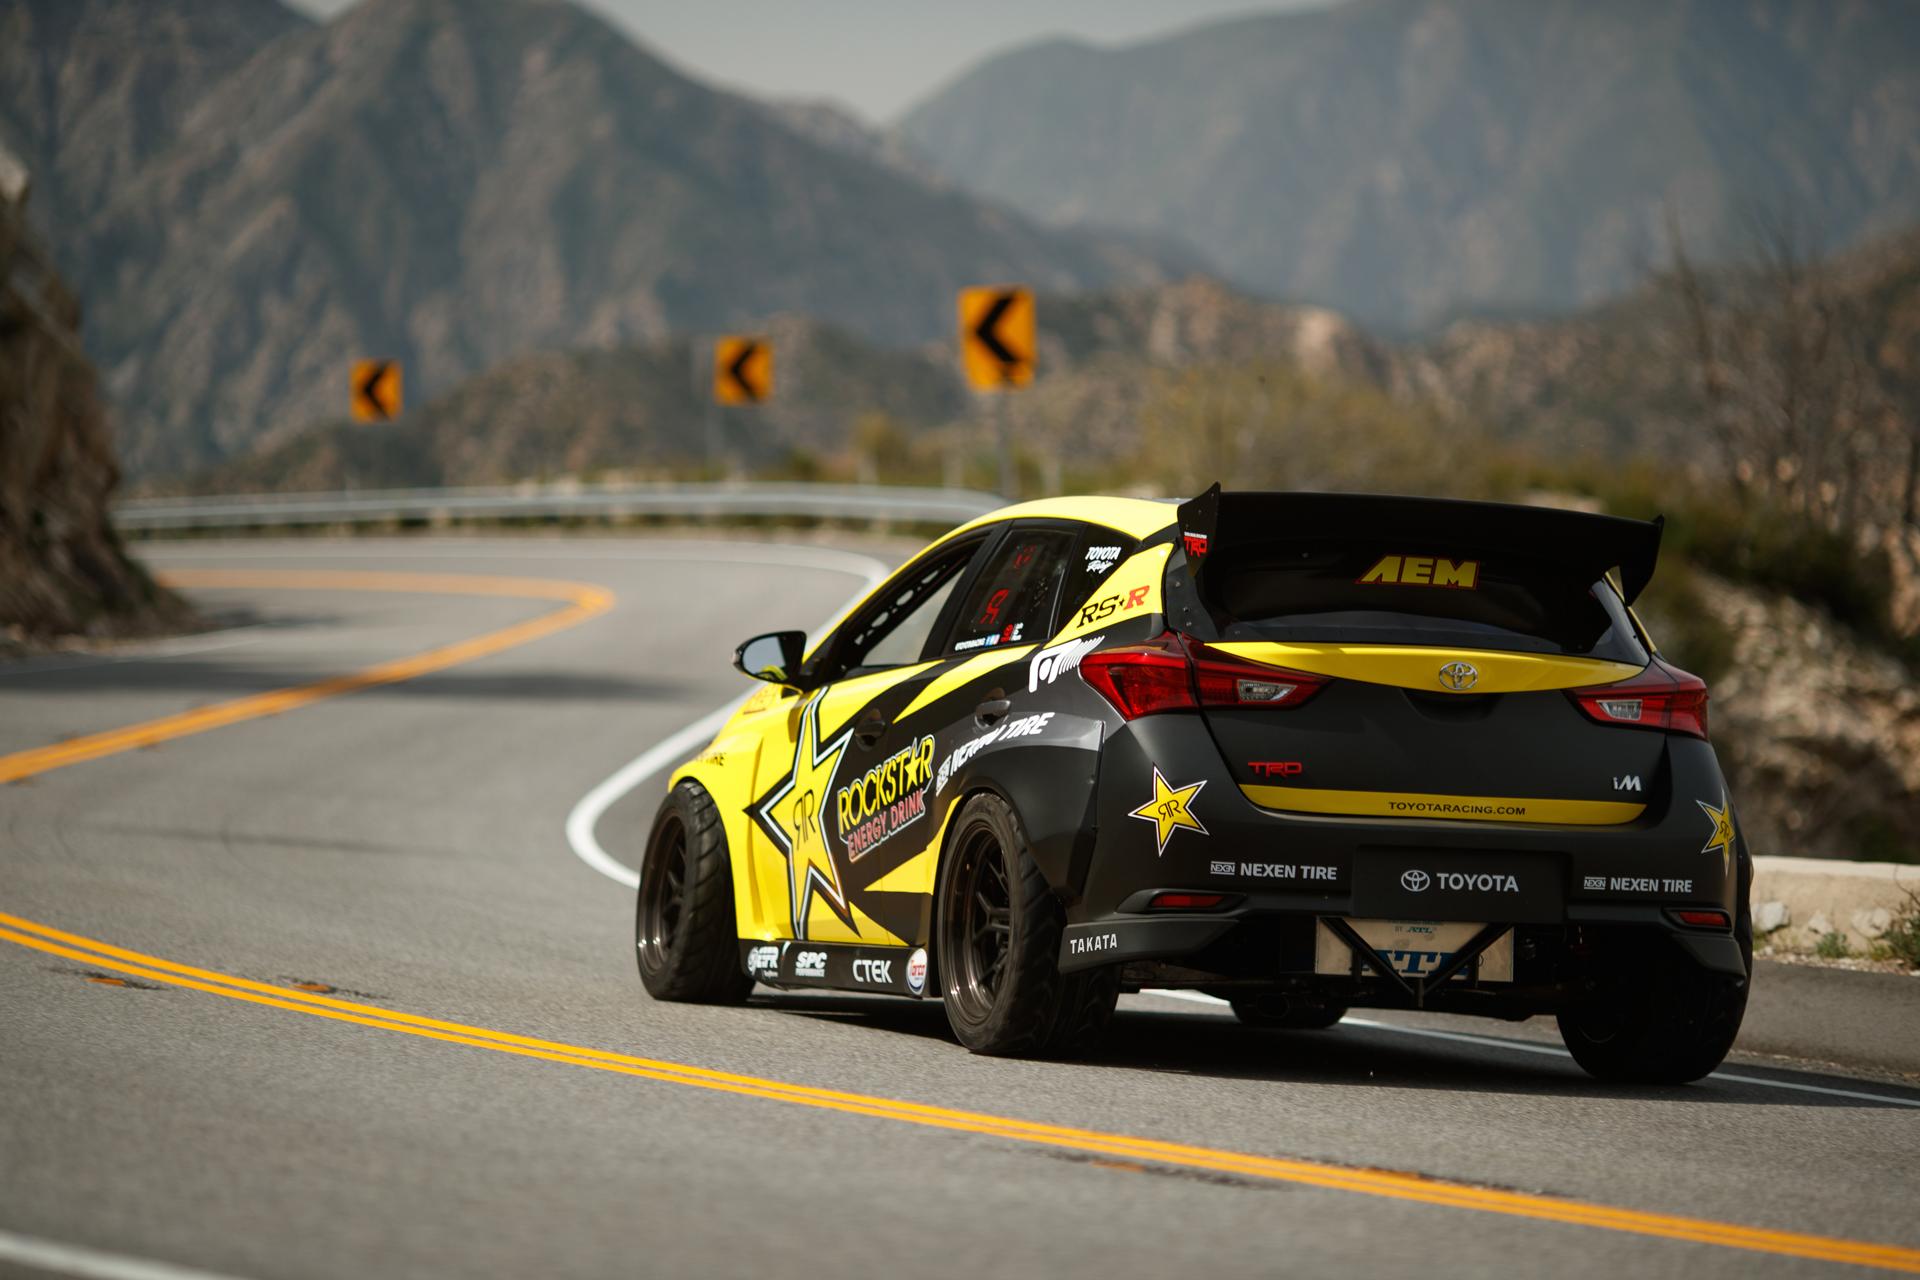 Drift Hype: Fredric Aasbo's New Drift Car Revealed (Video